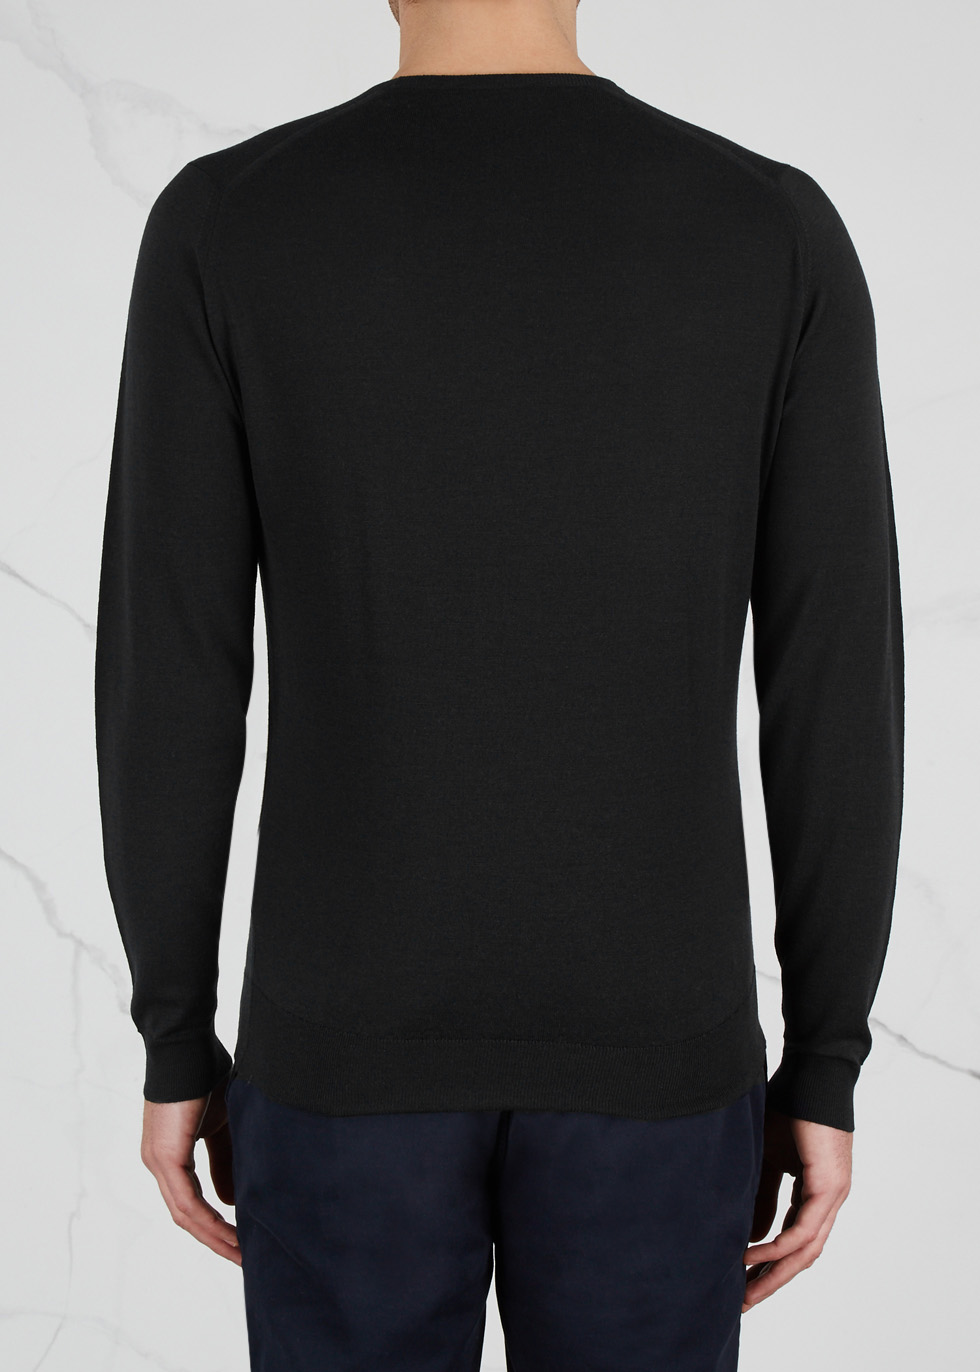 Lundy black fine-knit wool jumper - John Smedley